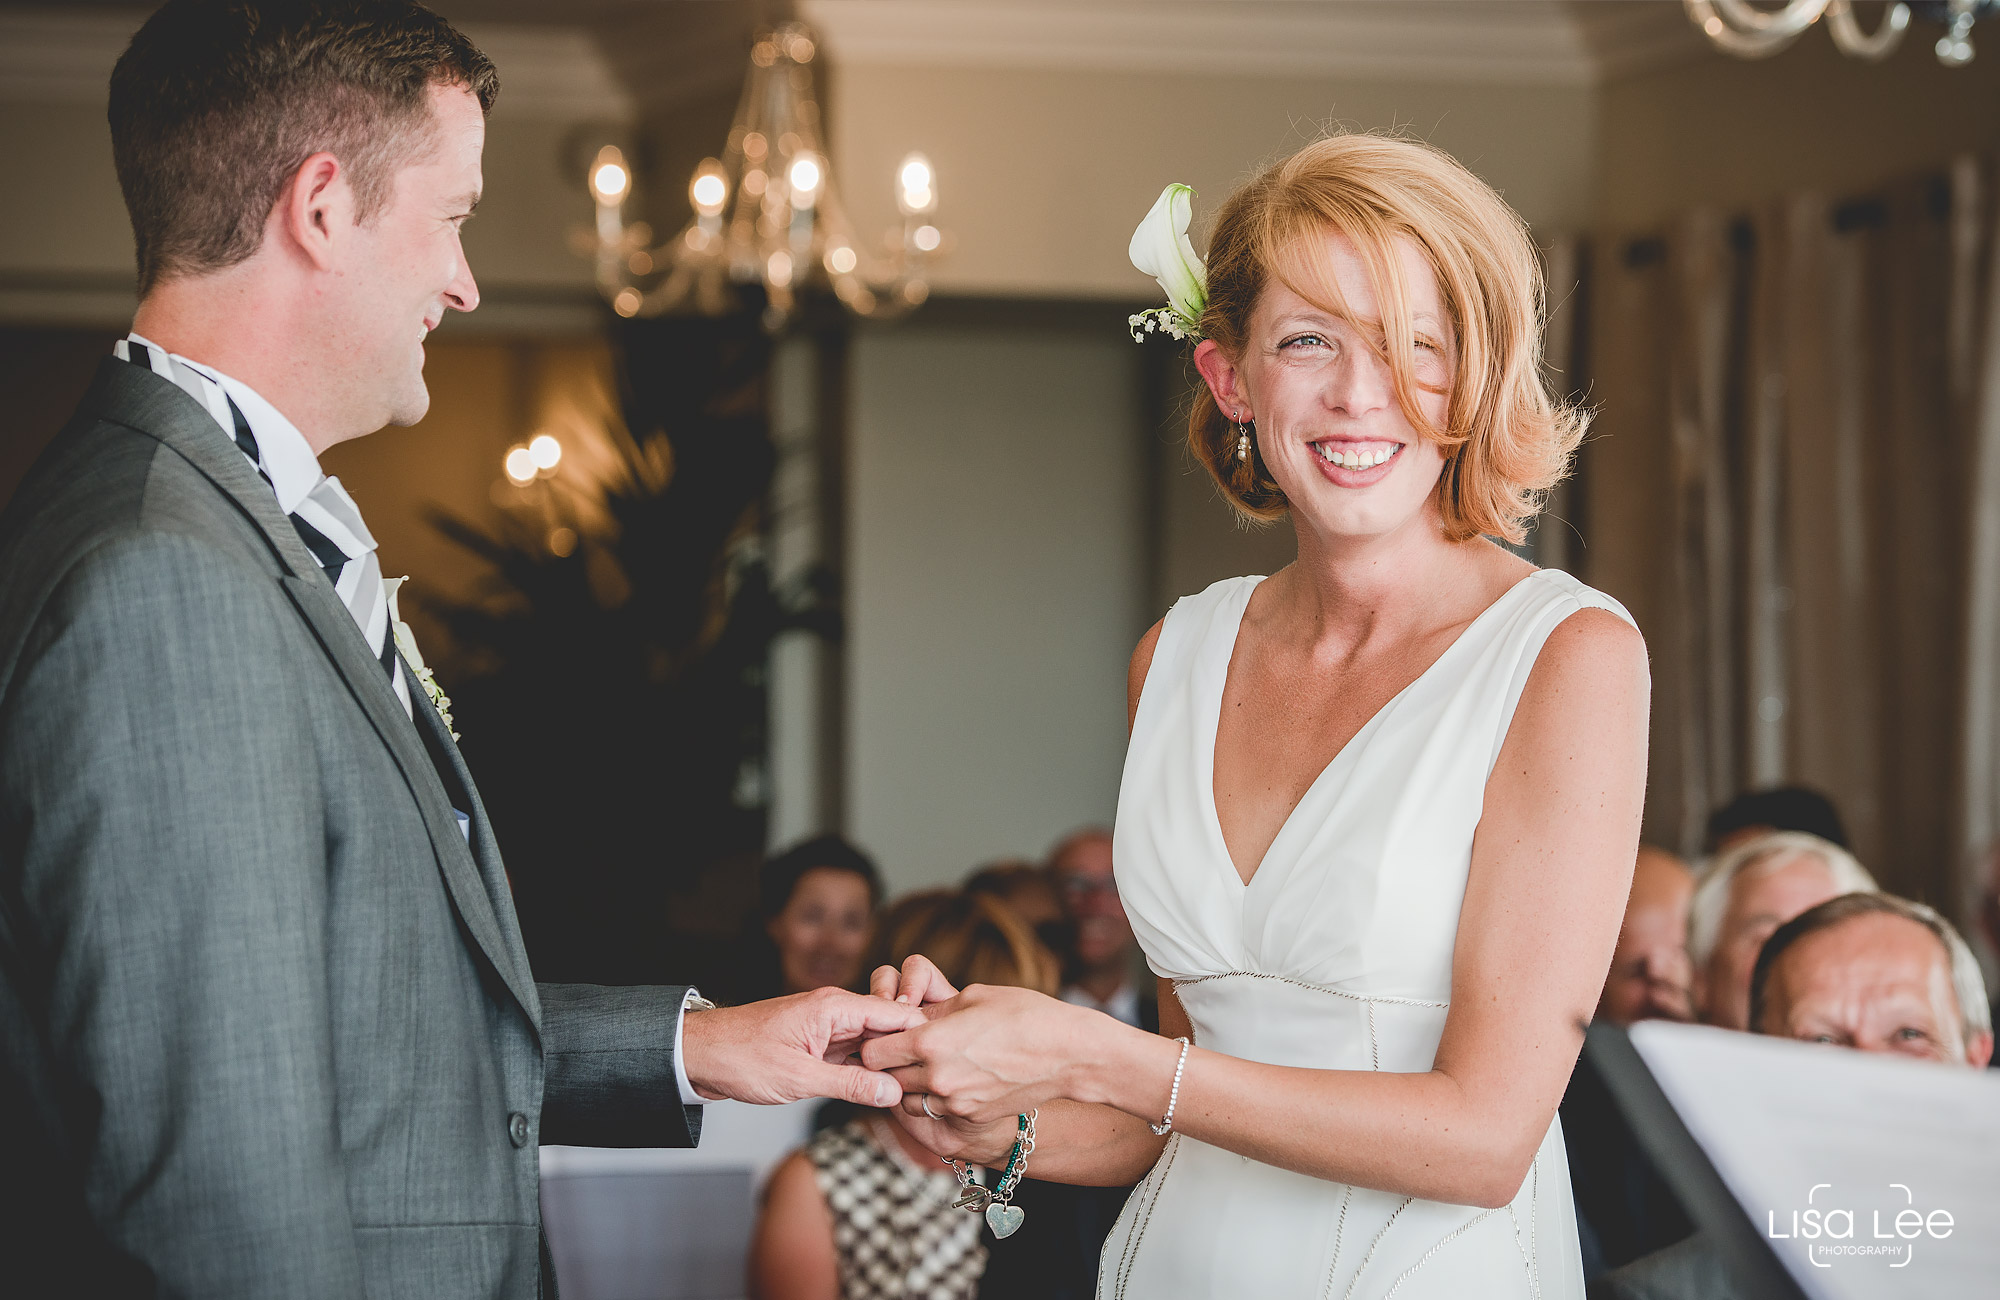 lisa-lee-wedding-photography-christchurch-dorset-vows.jpg